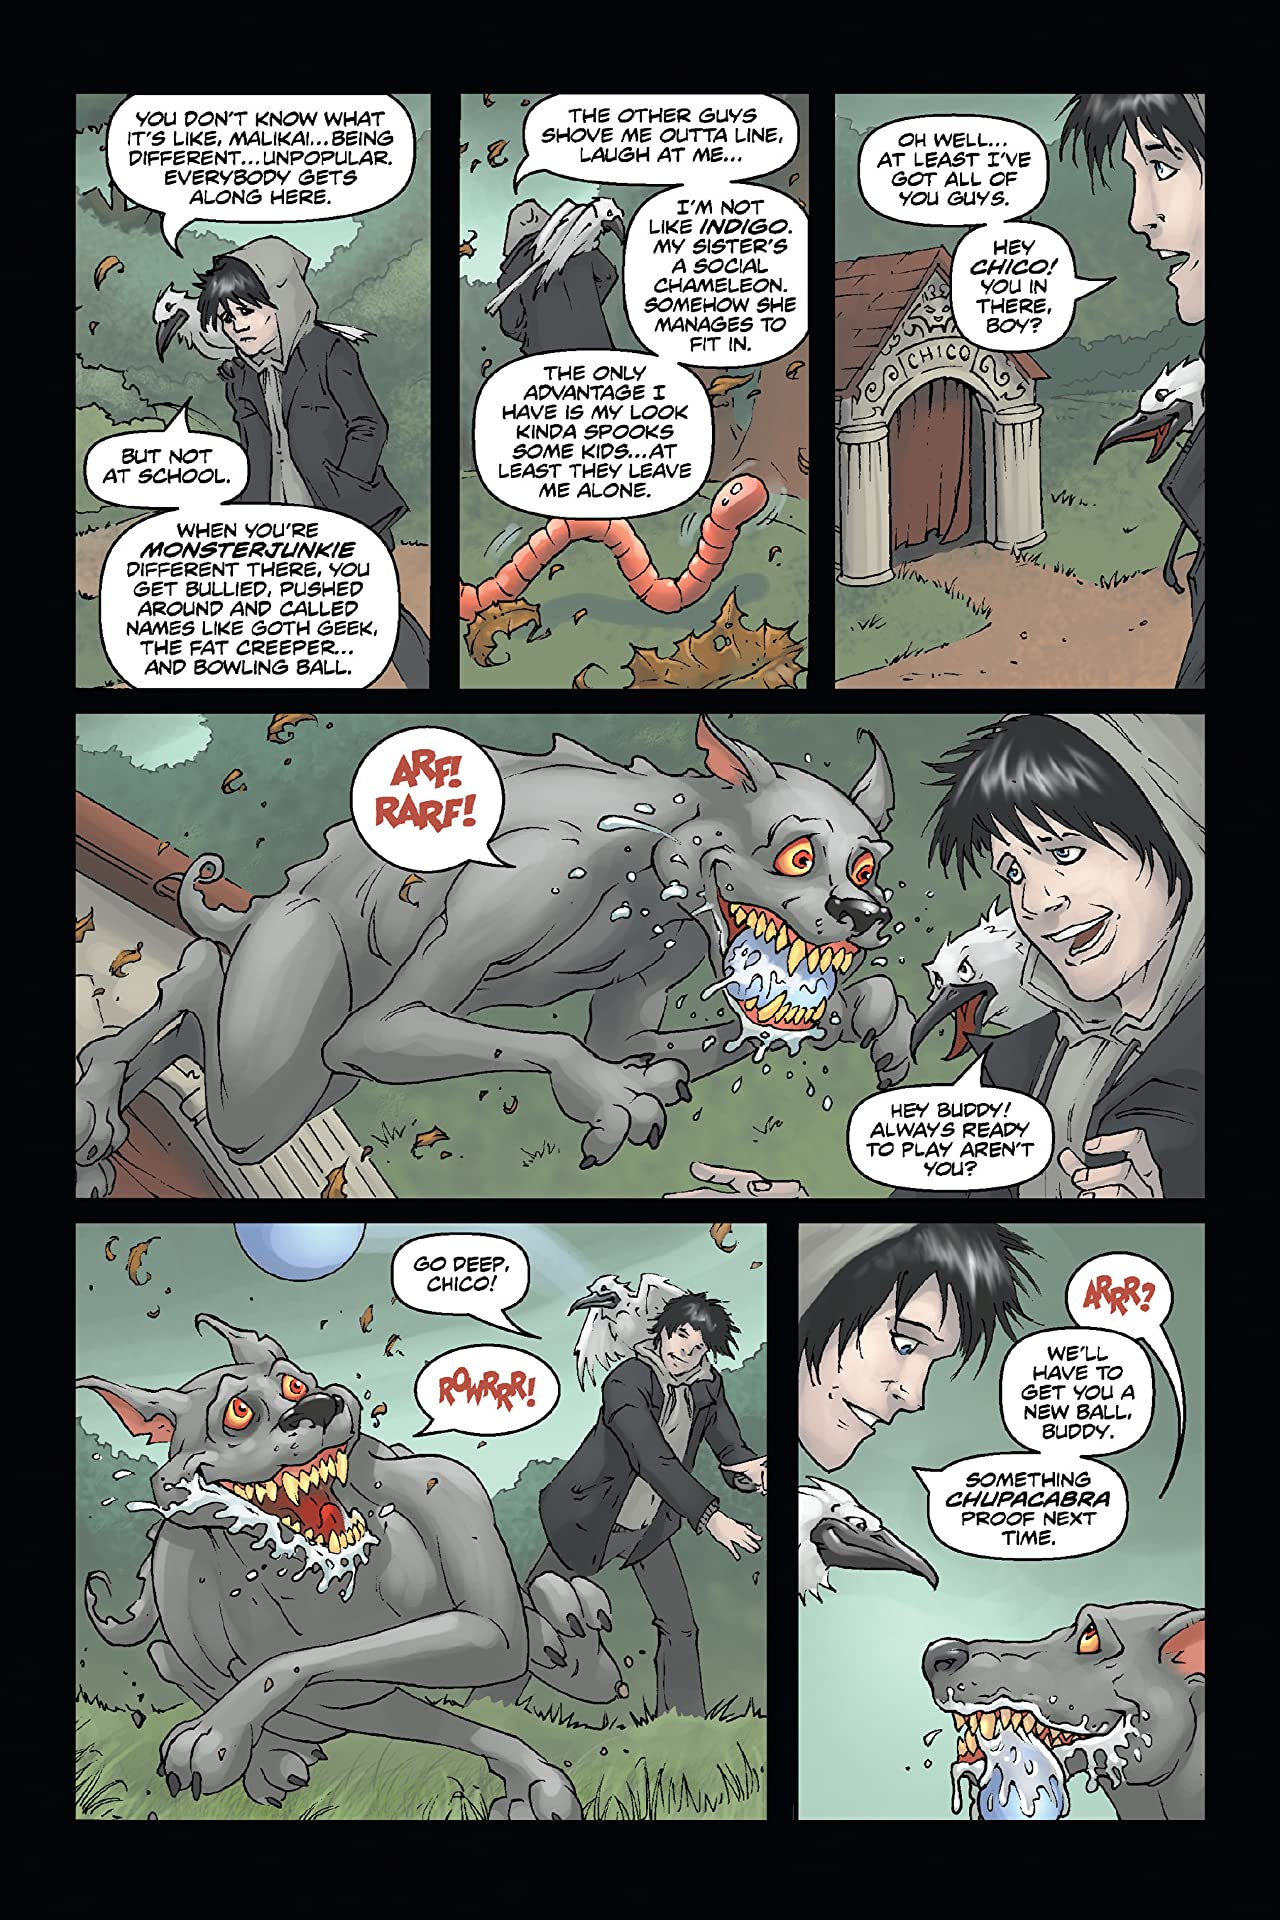 Erik Shein's Monsterjunkies: An American Family Odyssey